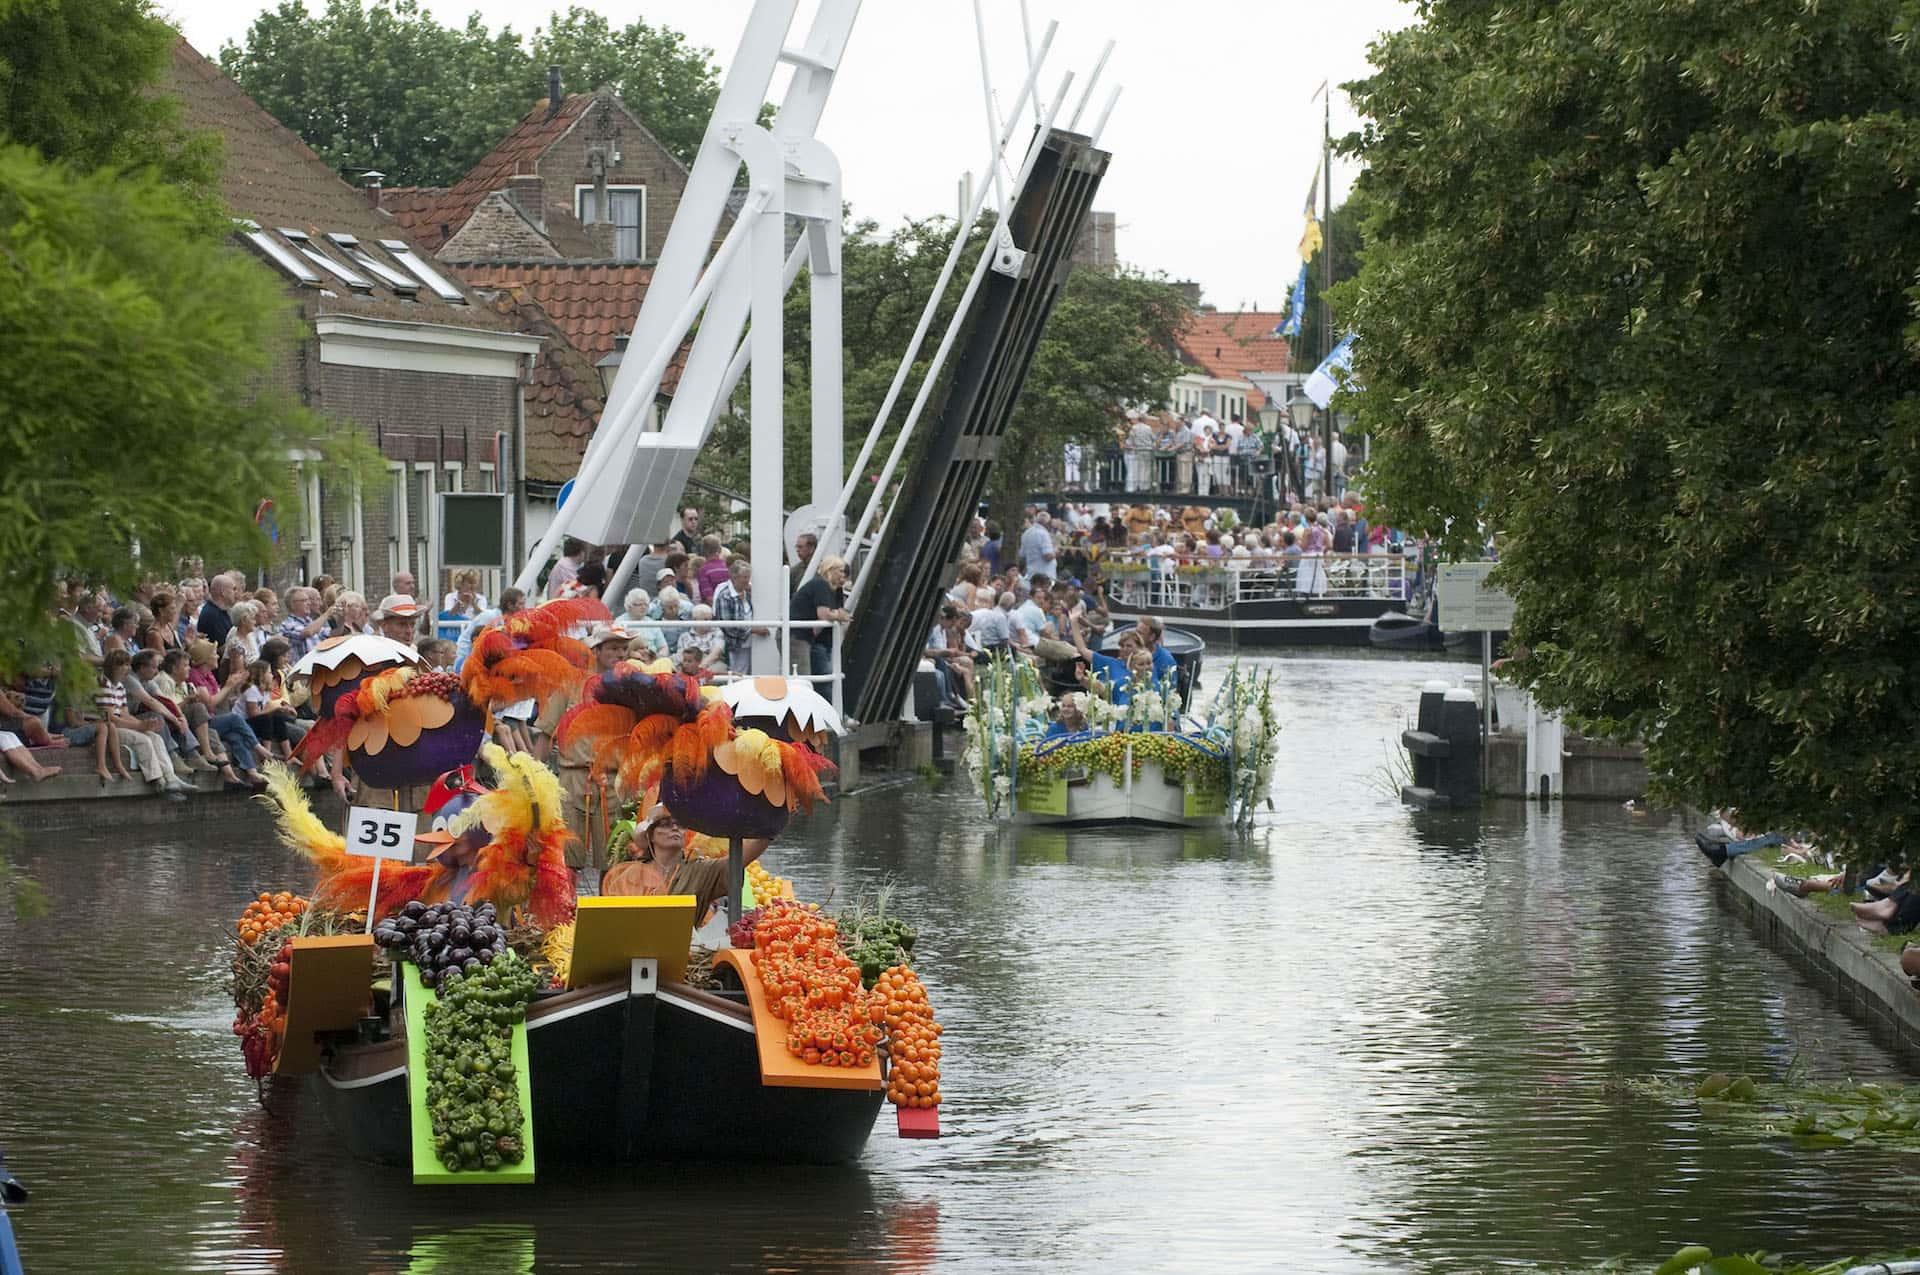 Varend Corso Westland - Mamaliefde.nl